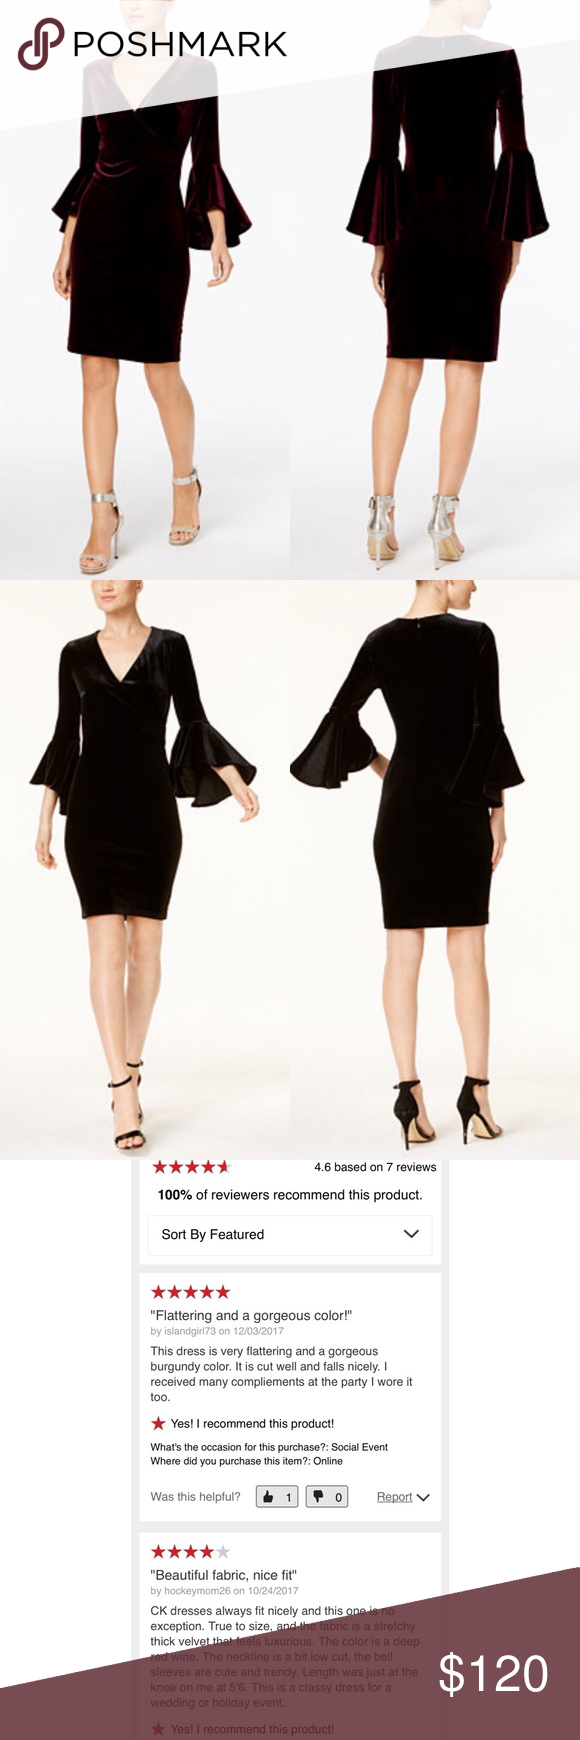 5f361cb0a6f30 Sexy BLACK Velvet V-neck Bell-Sleeve Wrap Dress Size 2. Calvin Klein  Elegant Classy Trendy Black Velvet Dress. Second picture shows actual color  of dress.